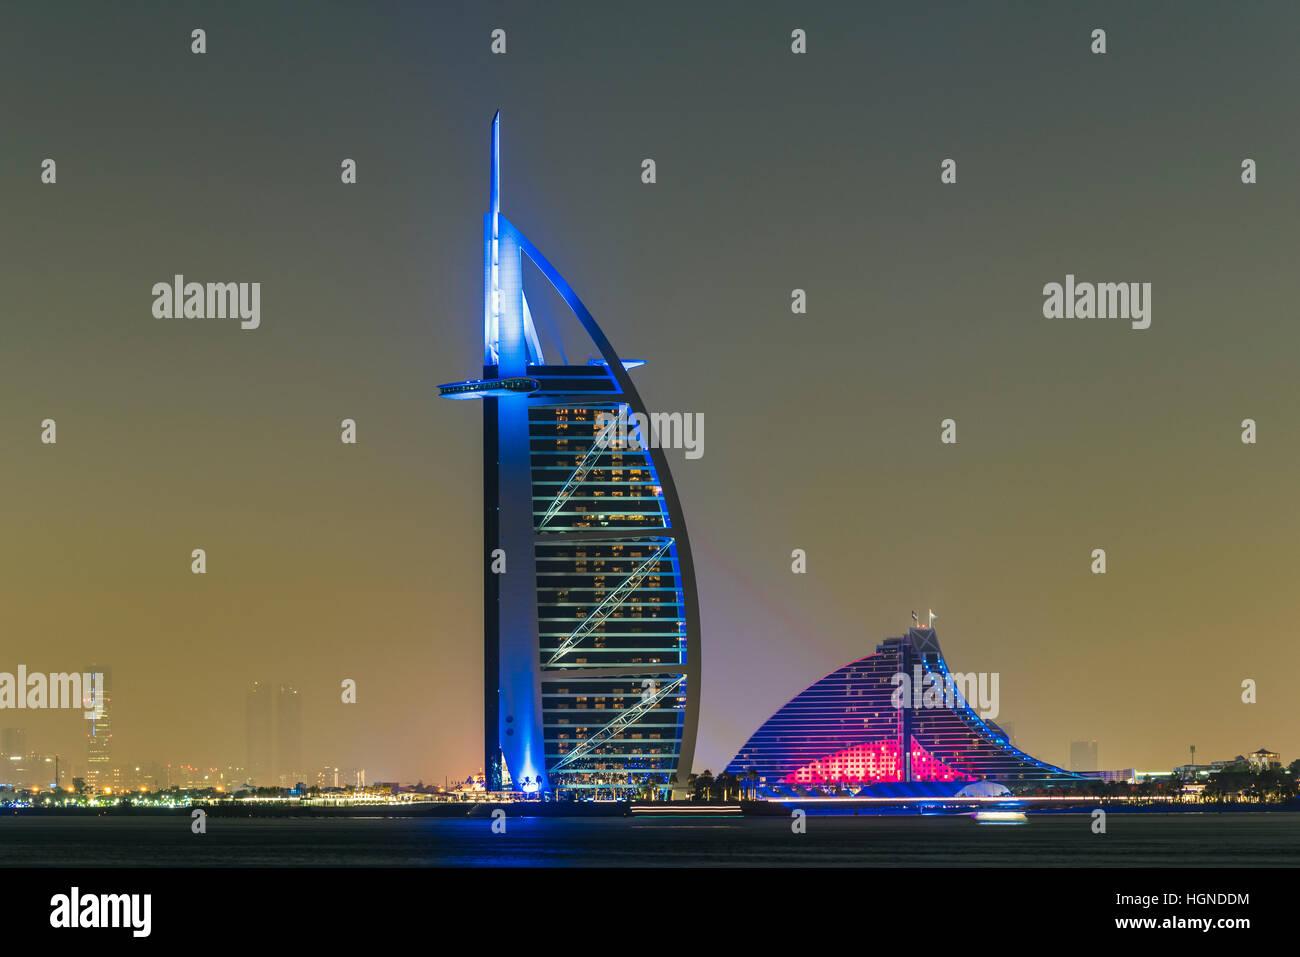 Night view of Burj al Arab and Jumeirah Beach Hotel, Dubai, United Arab Emirates - Stock Image